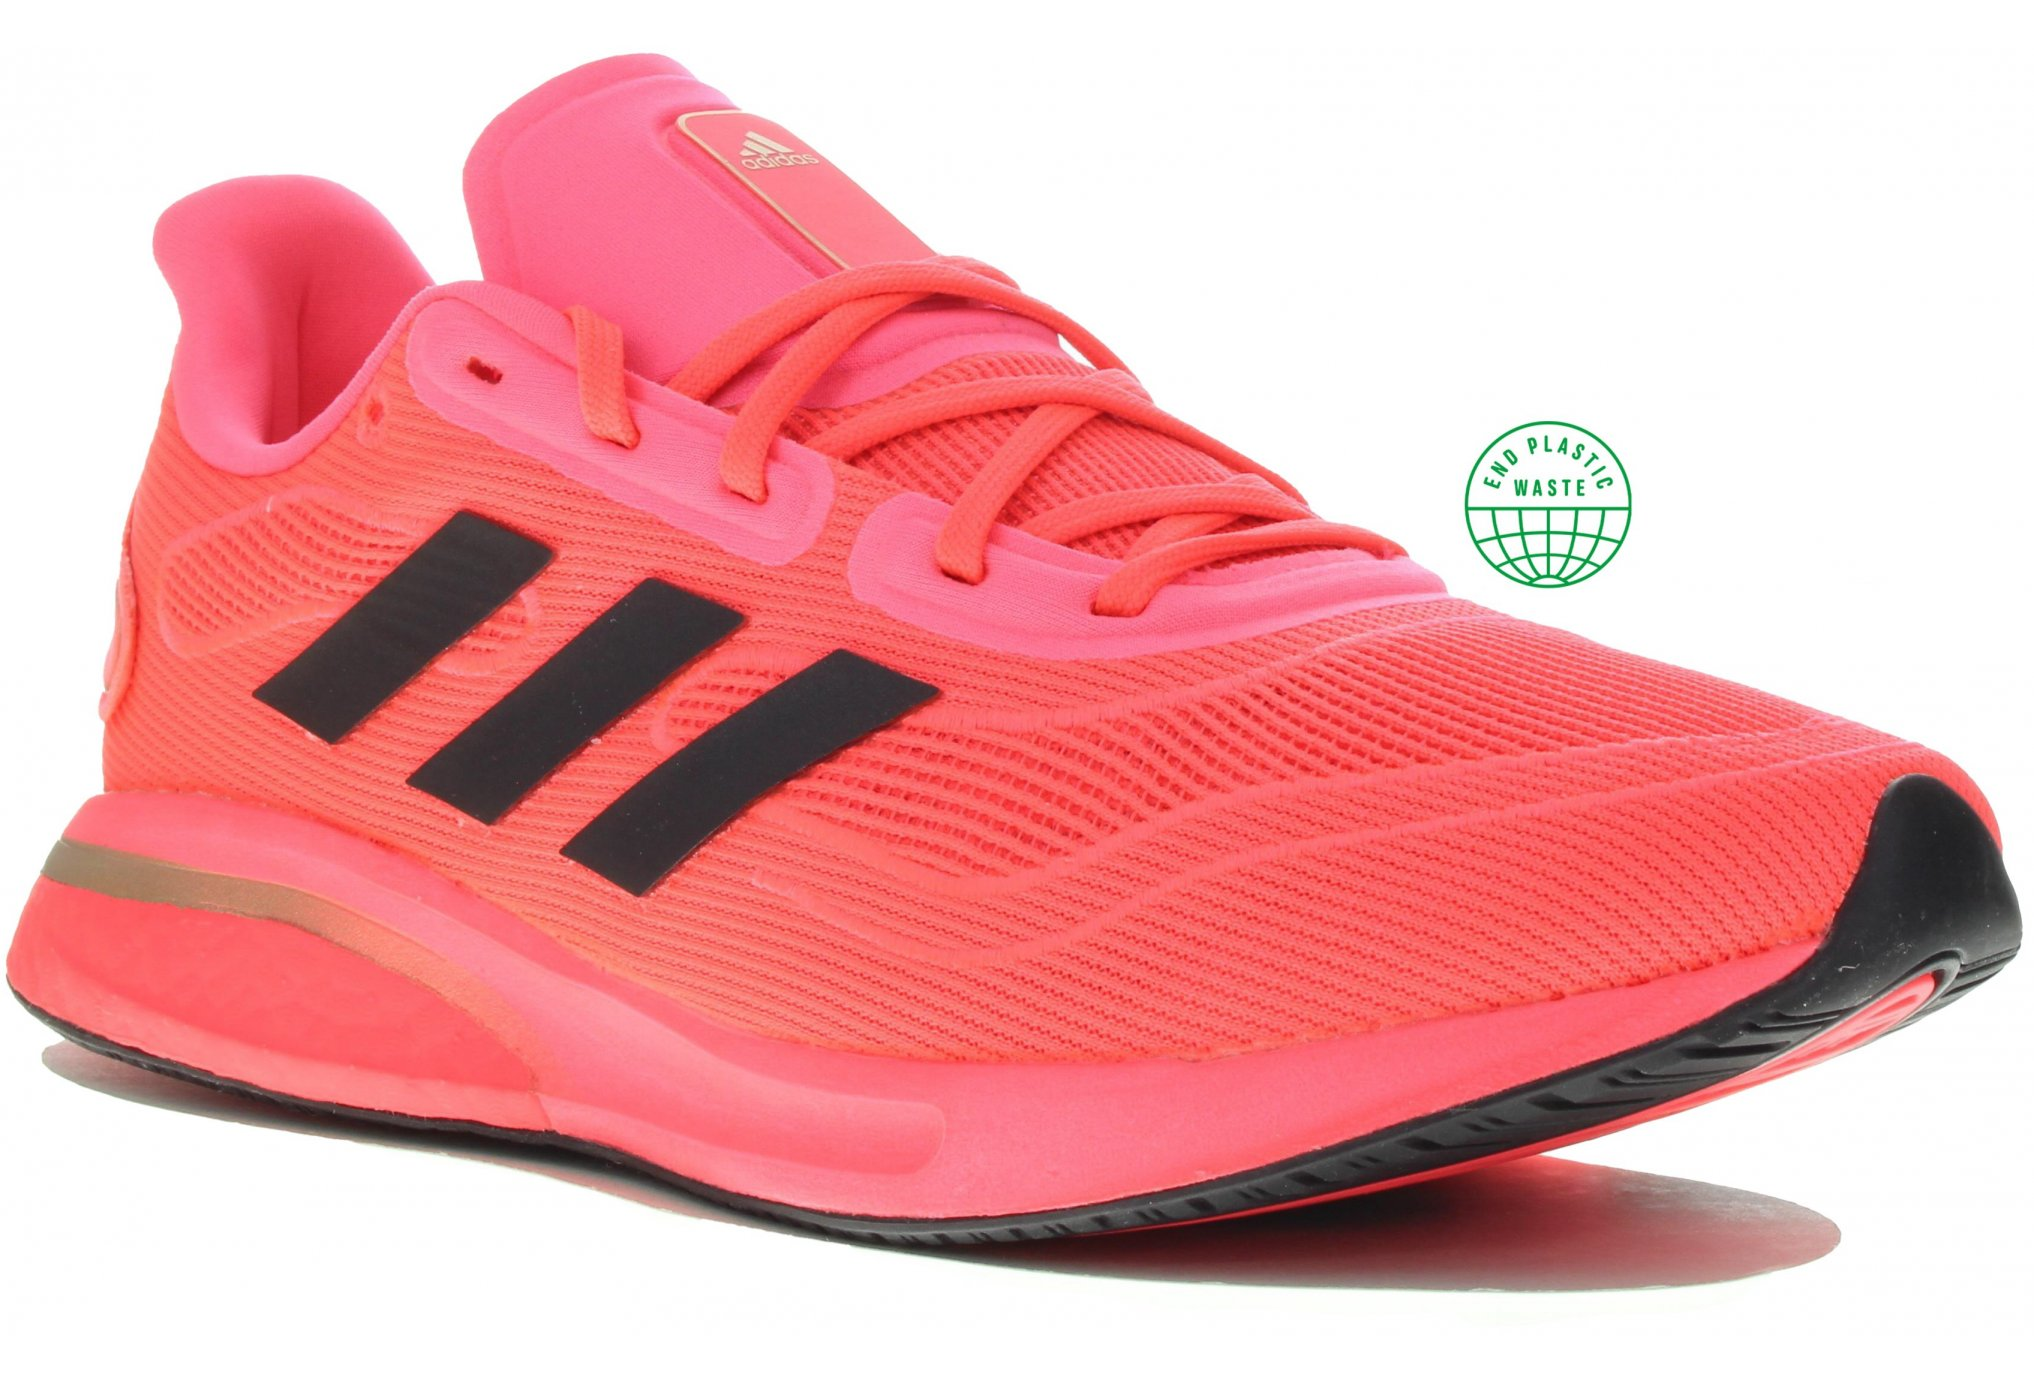 adidas Supernova Primegreen M Chaussures homme